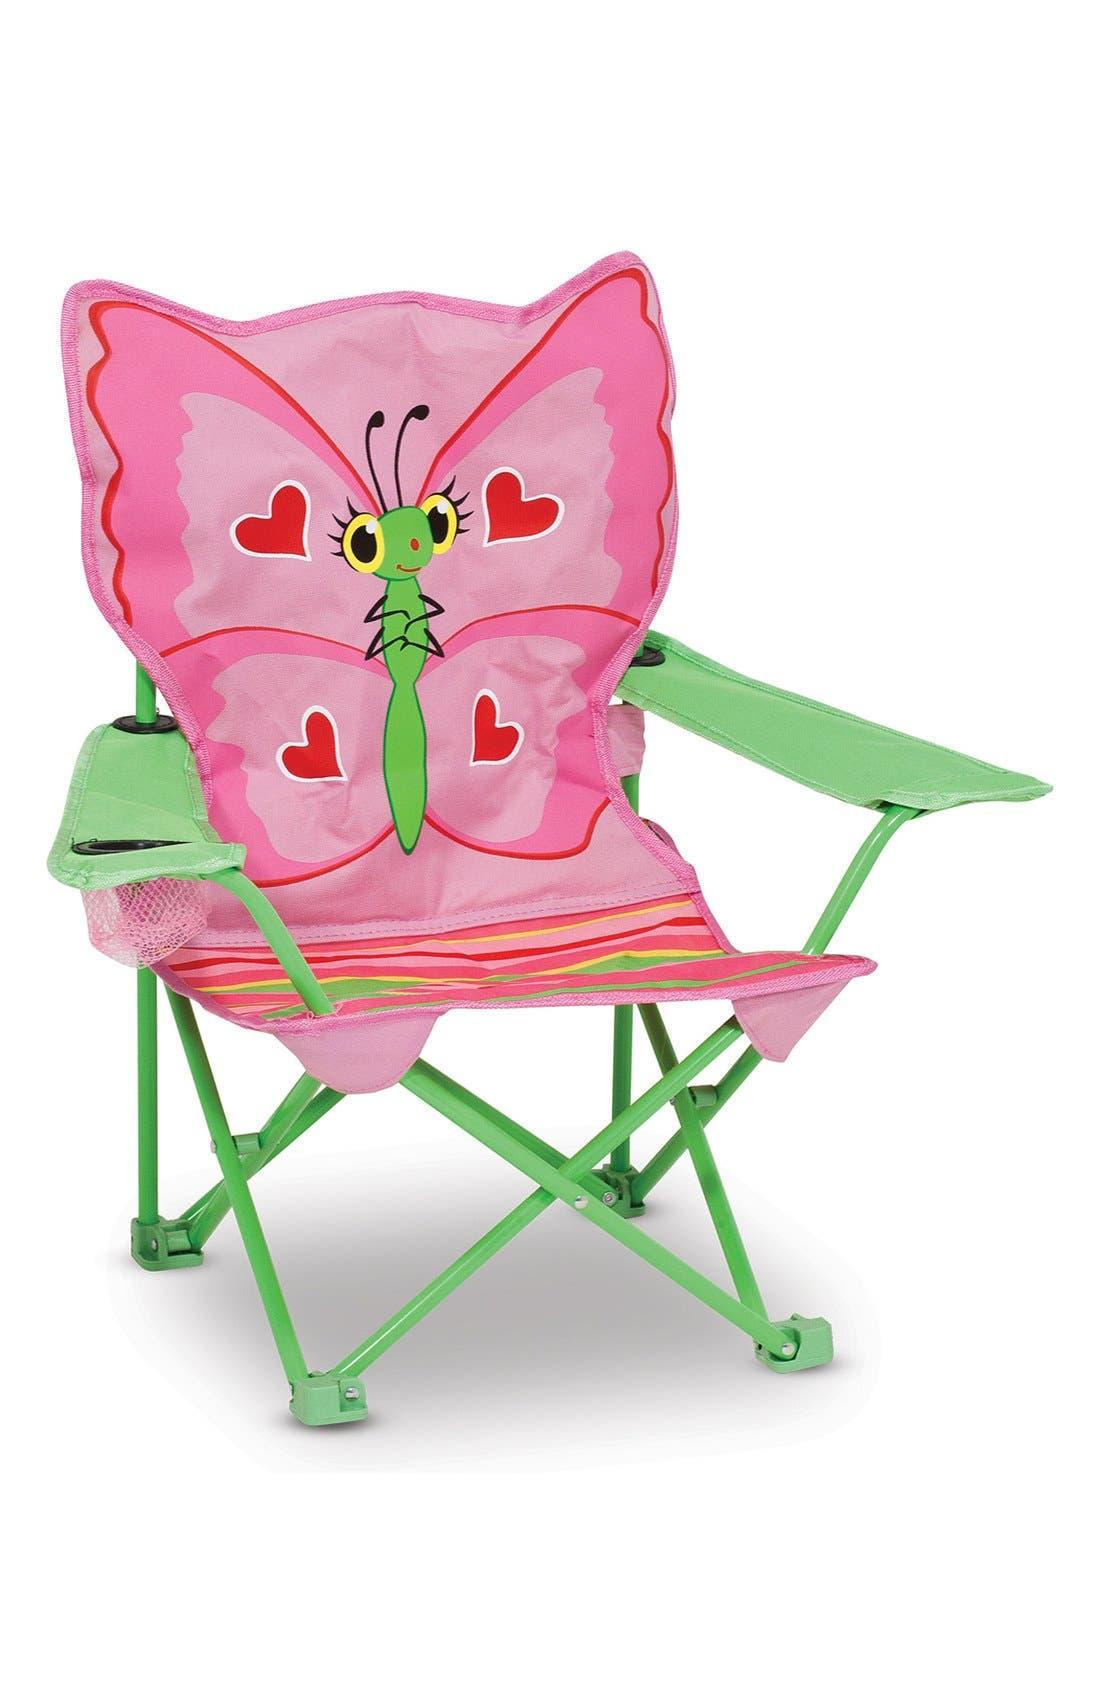 Melissa & Doug 'Bella Butterfly' Folding Chair